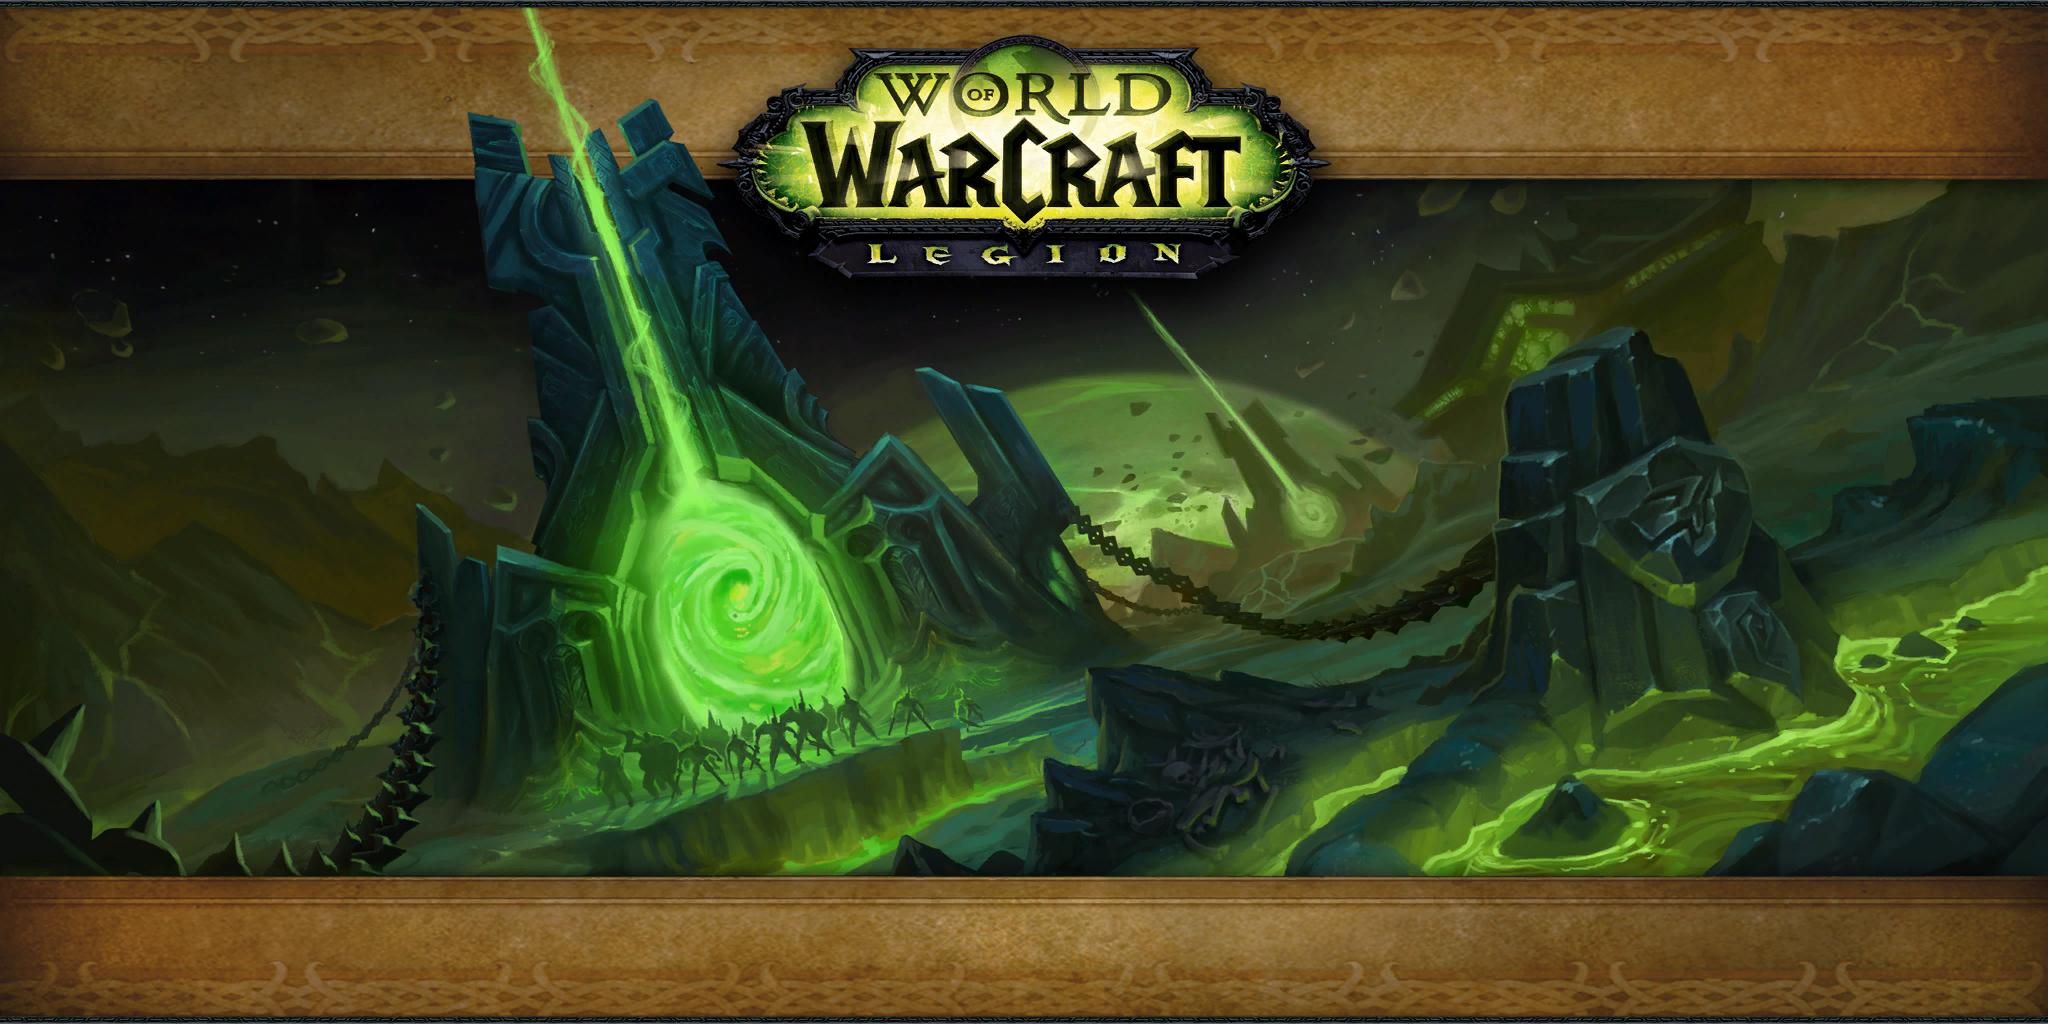 world of warcraft jokes